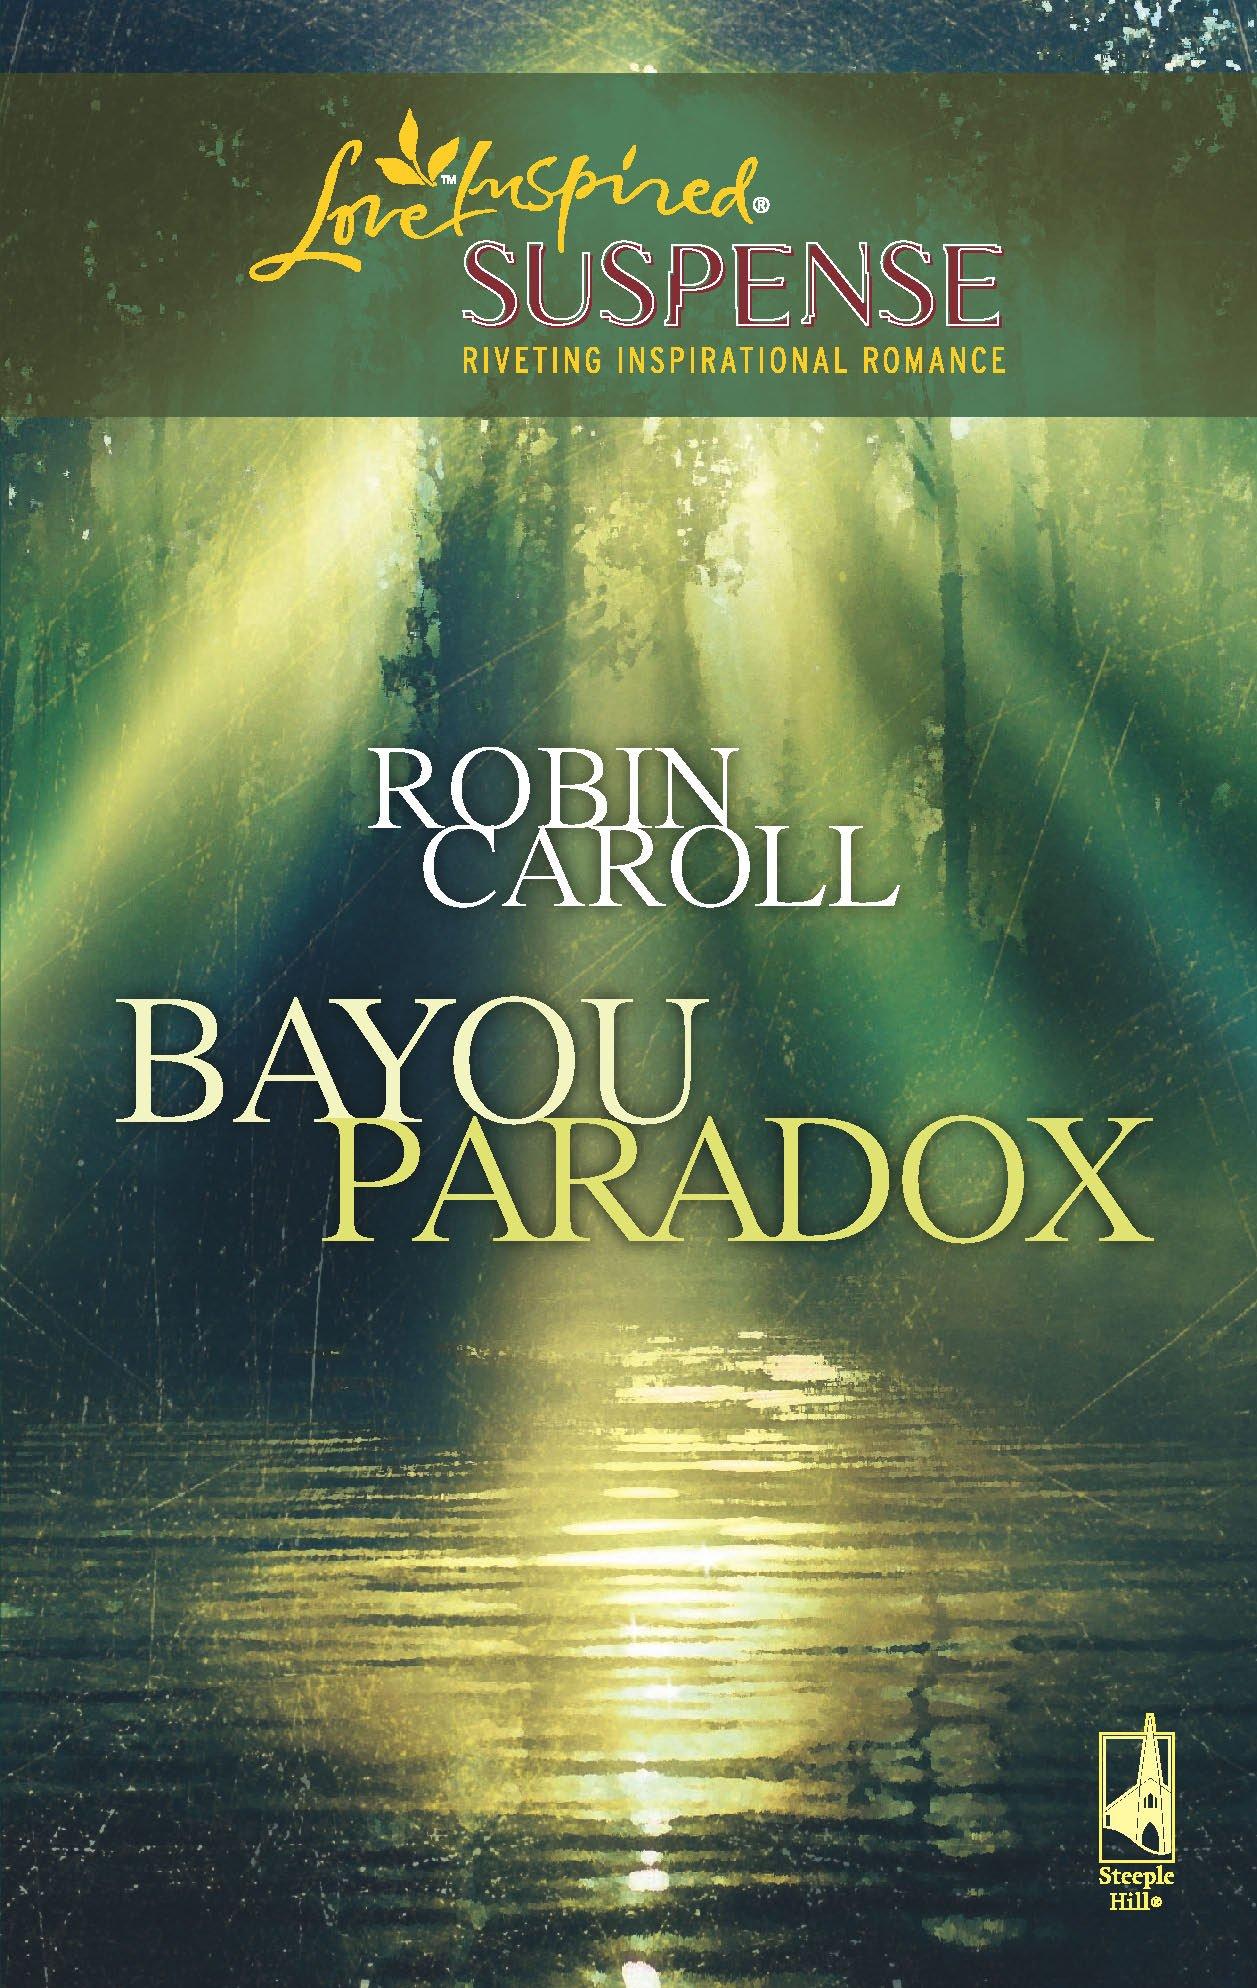 Download Bayou Paradox (Bayou Series #4) (Steeple Hill Love Inspired Suspense #103) ebook